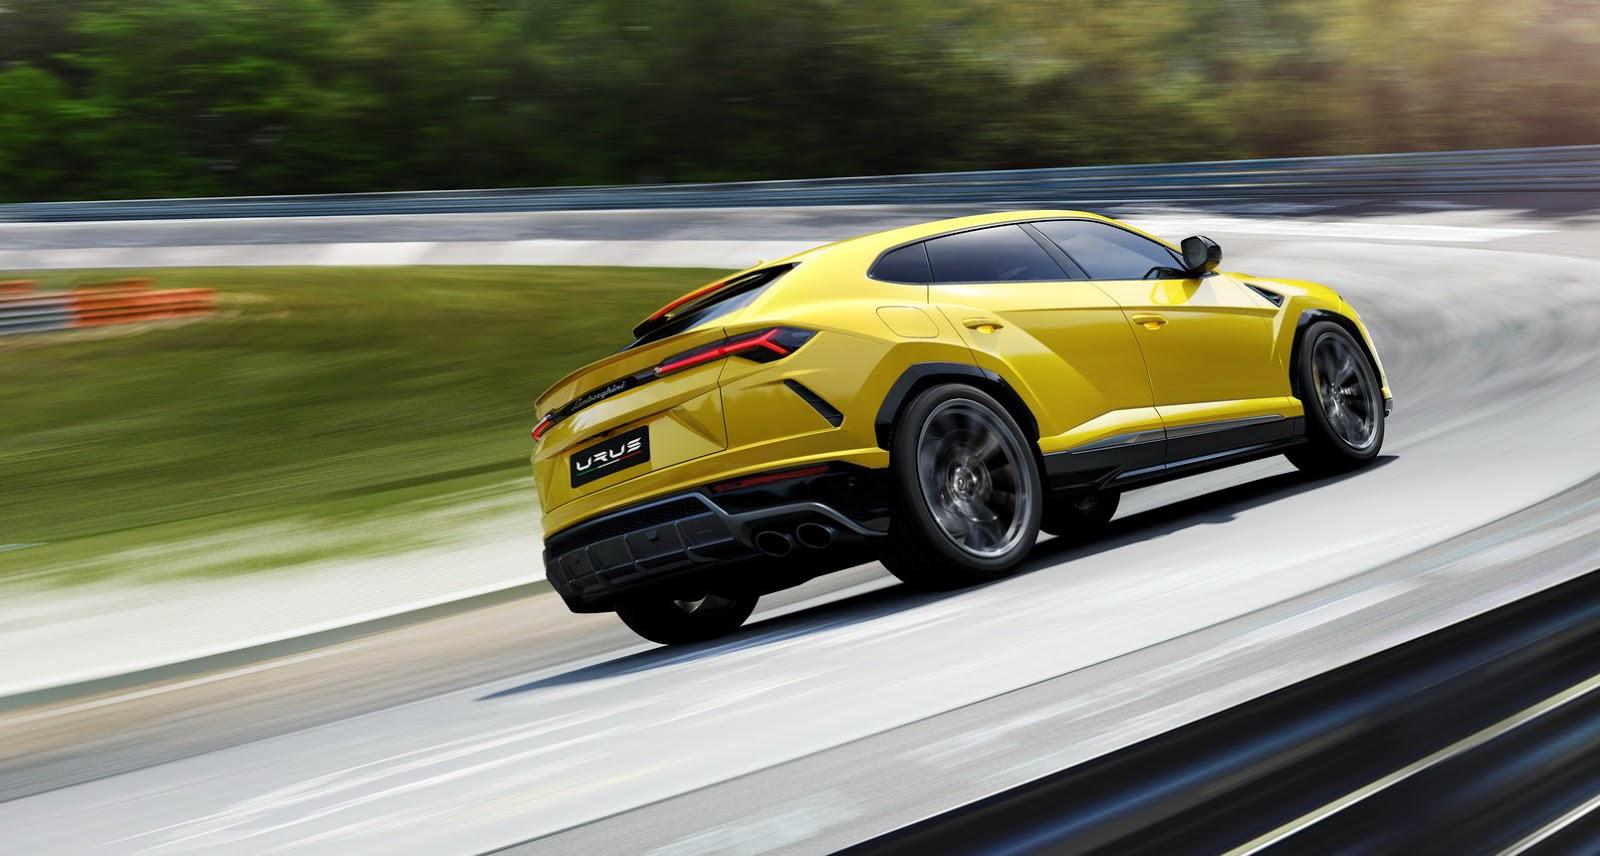 Lamborghini_Urus_tinhte_6.jpg